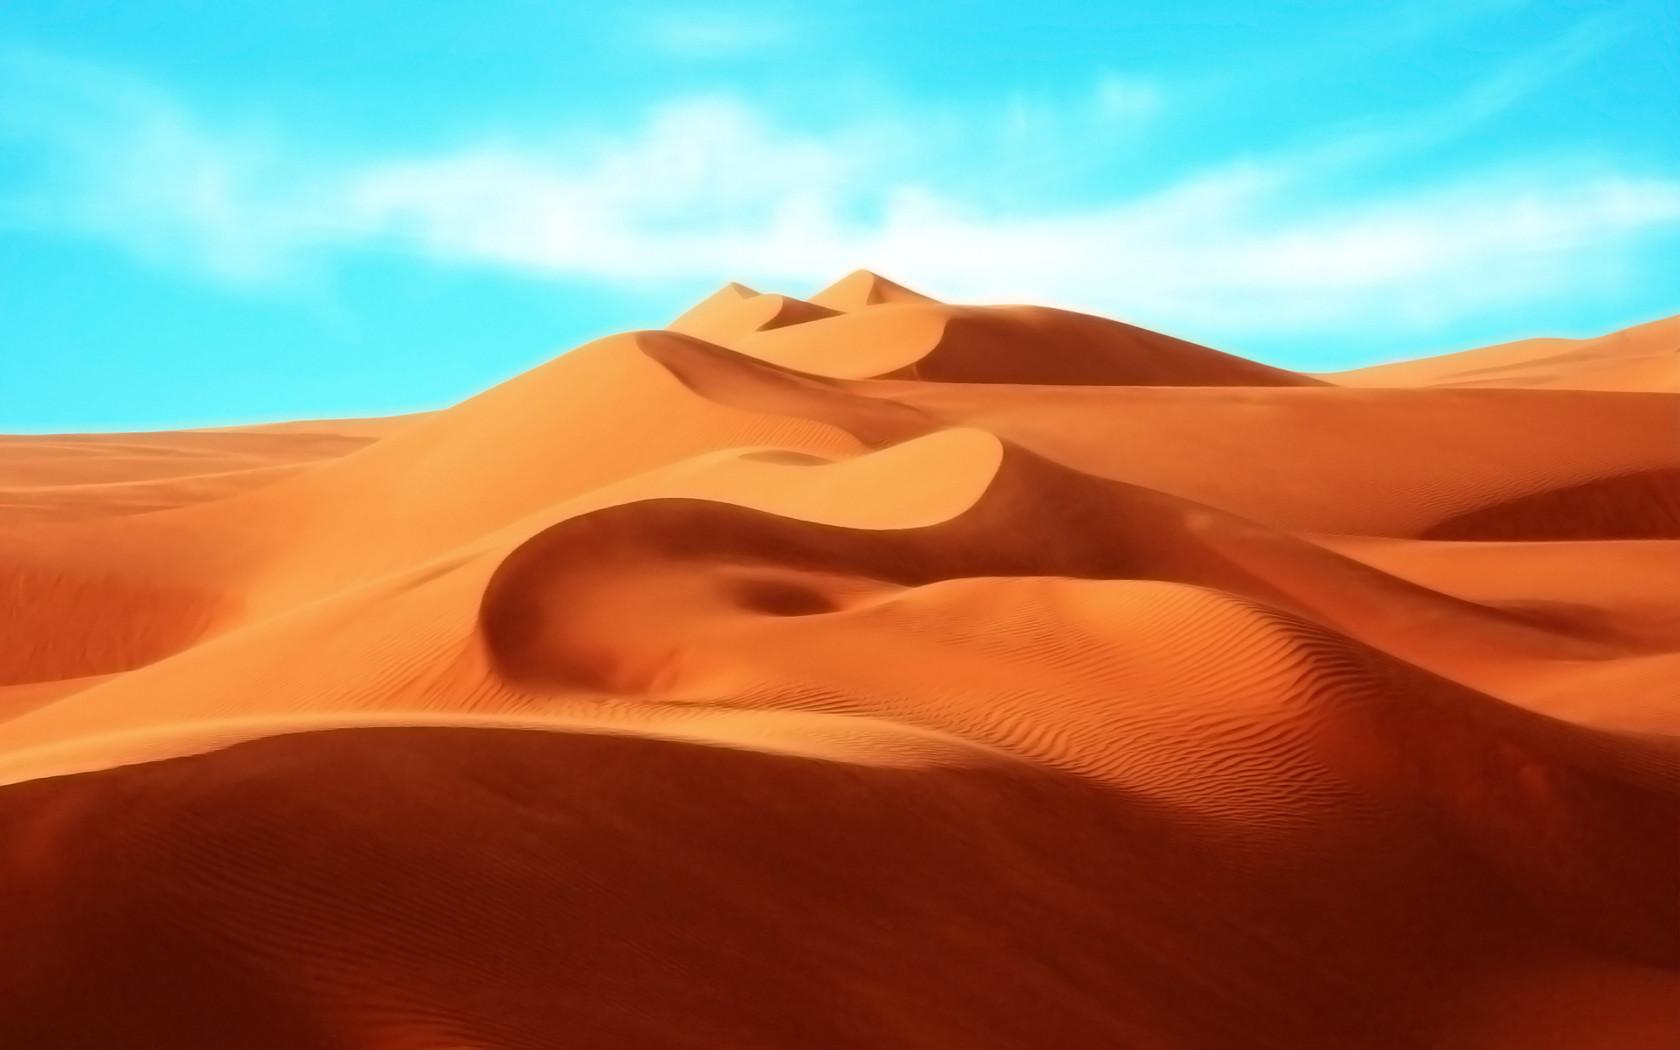 1920x1080 hd wallpaper dune - photo #25